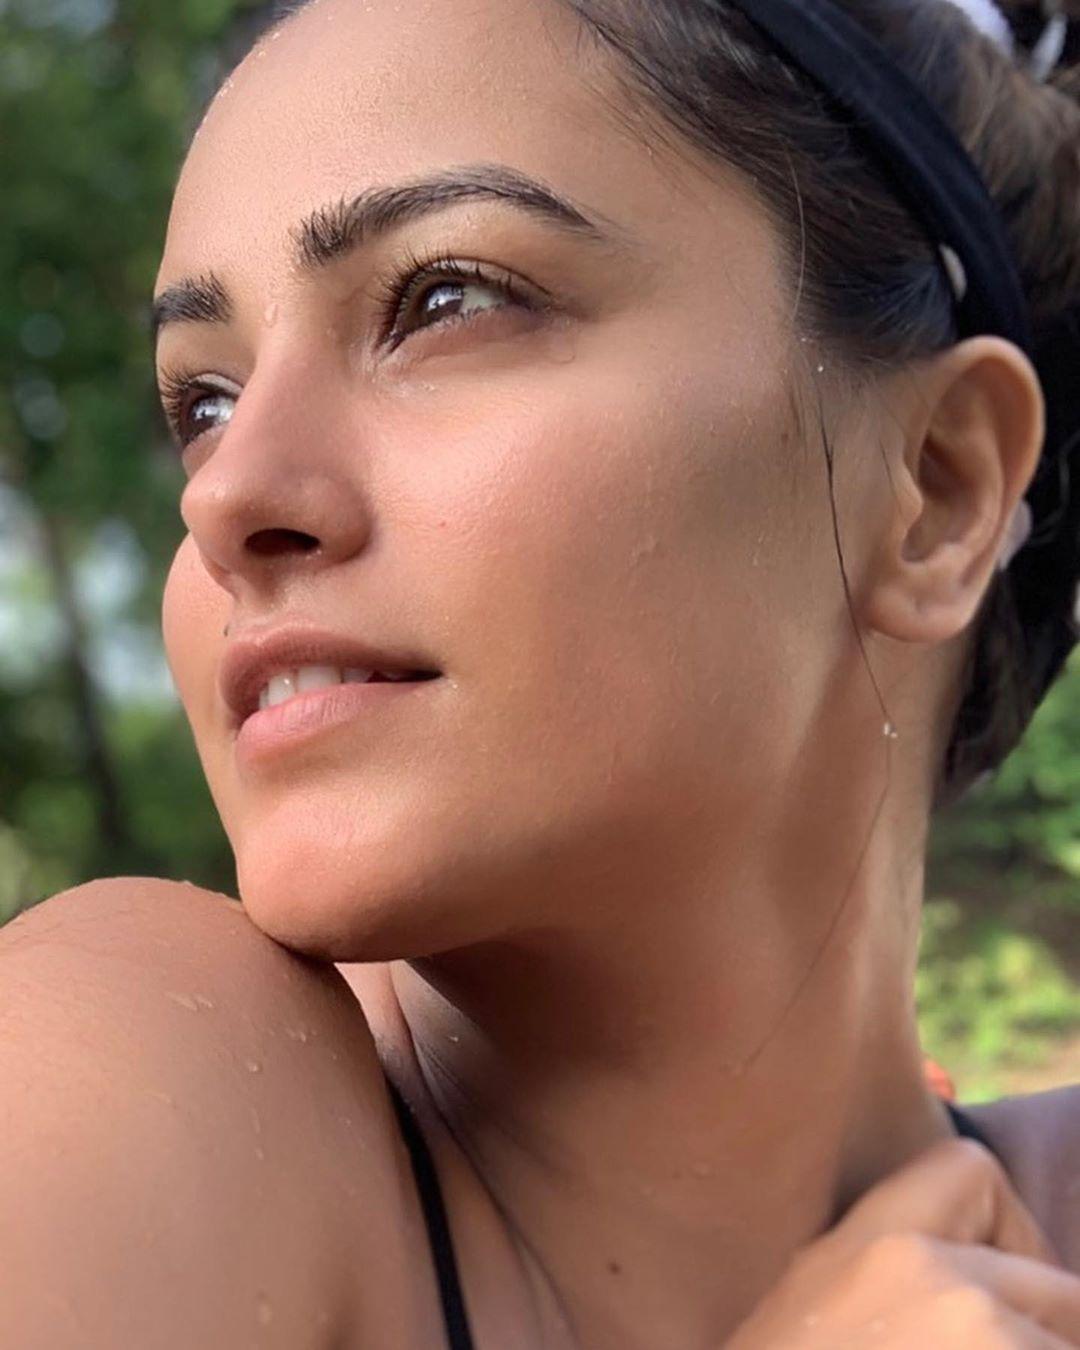 Bollywood Tadka,अनीता हसनंदानी इमेज,अनीता हसनंदानी फोटो,अनीता हसनंदानी पिक्चर